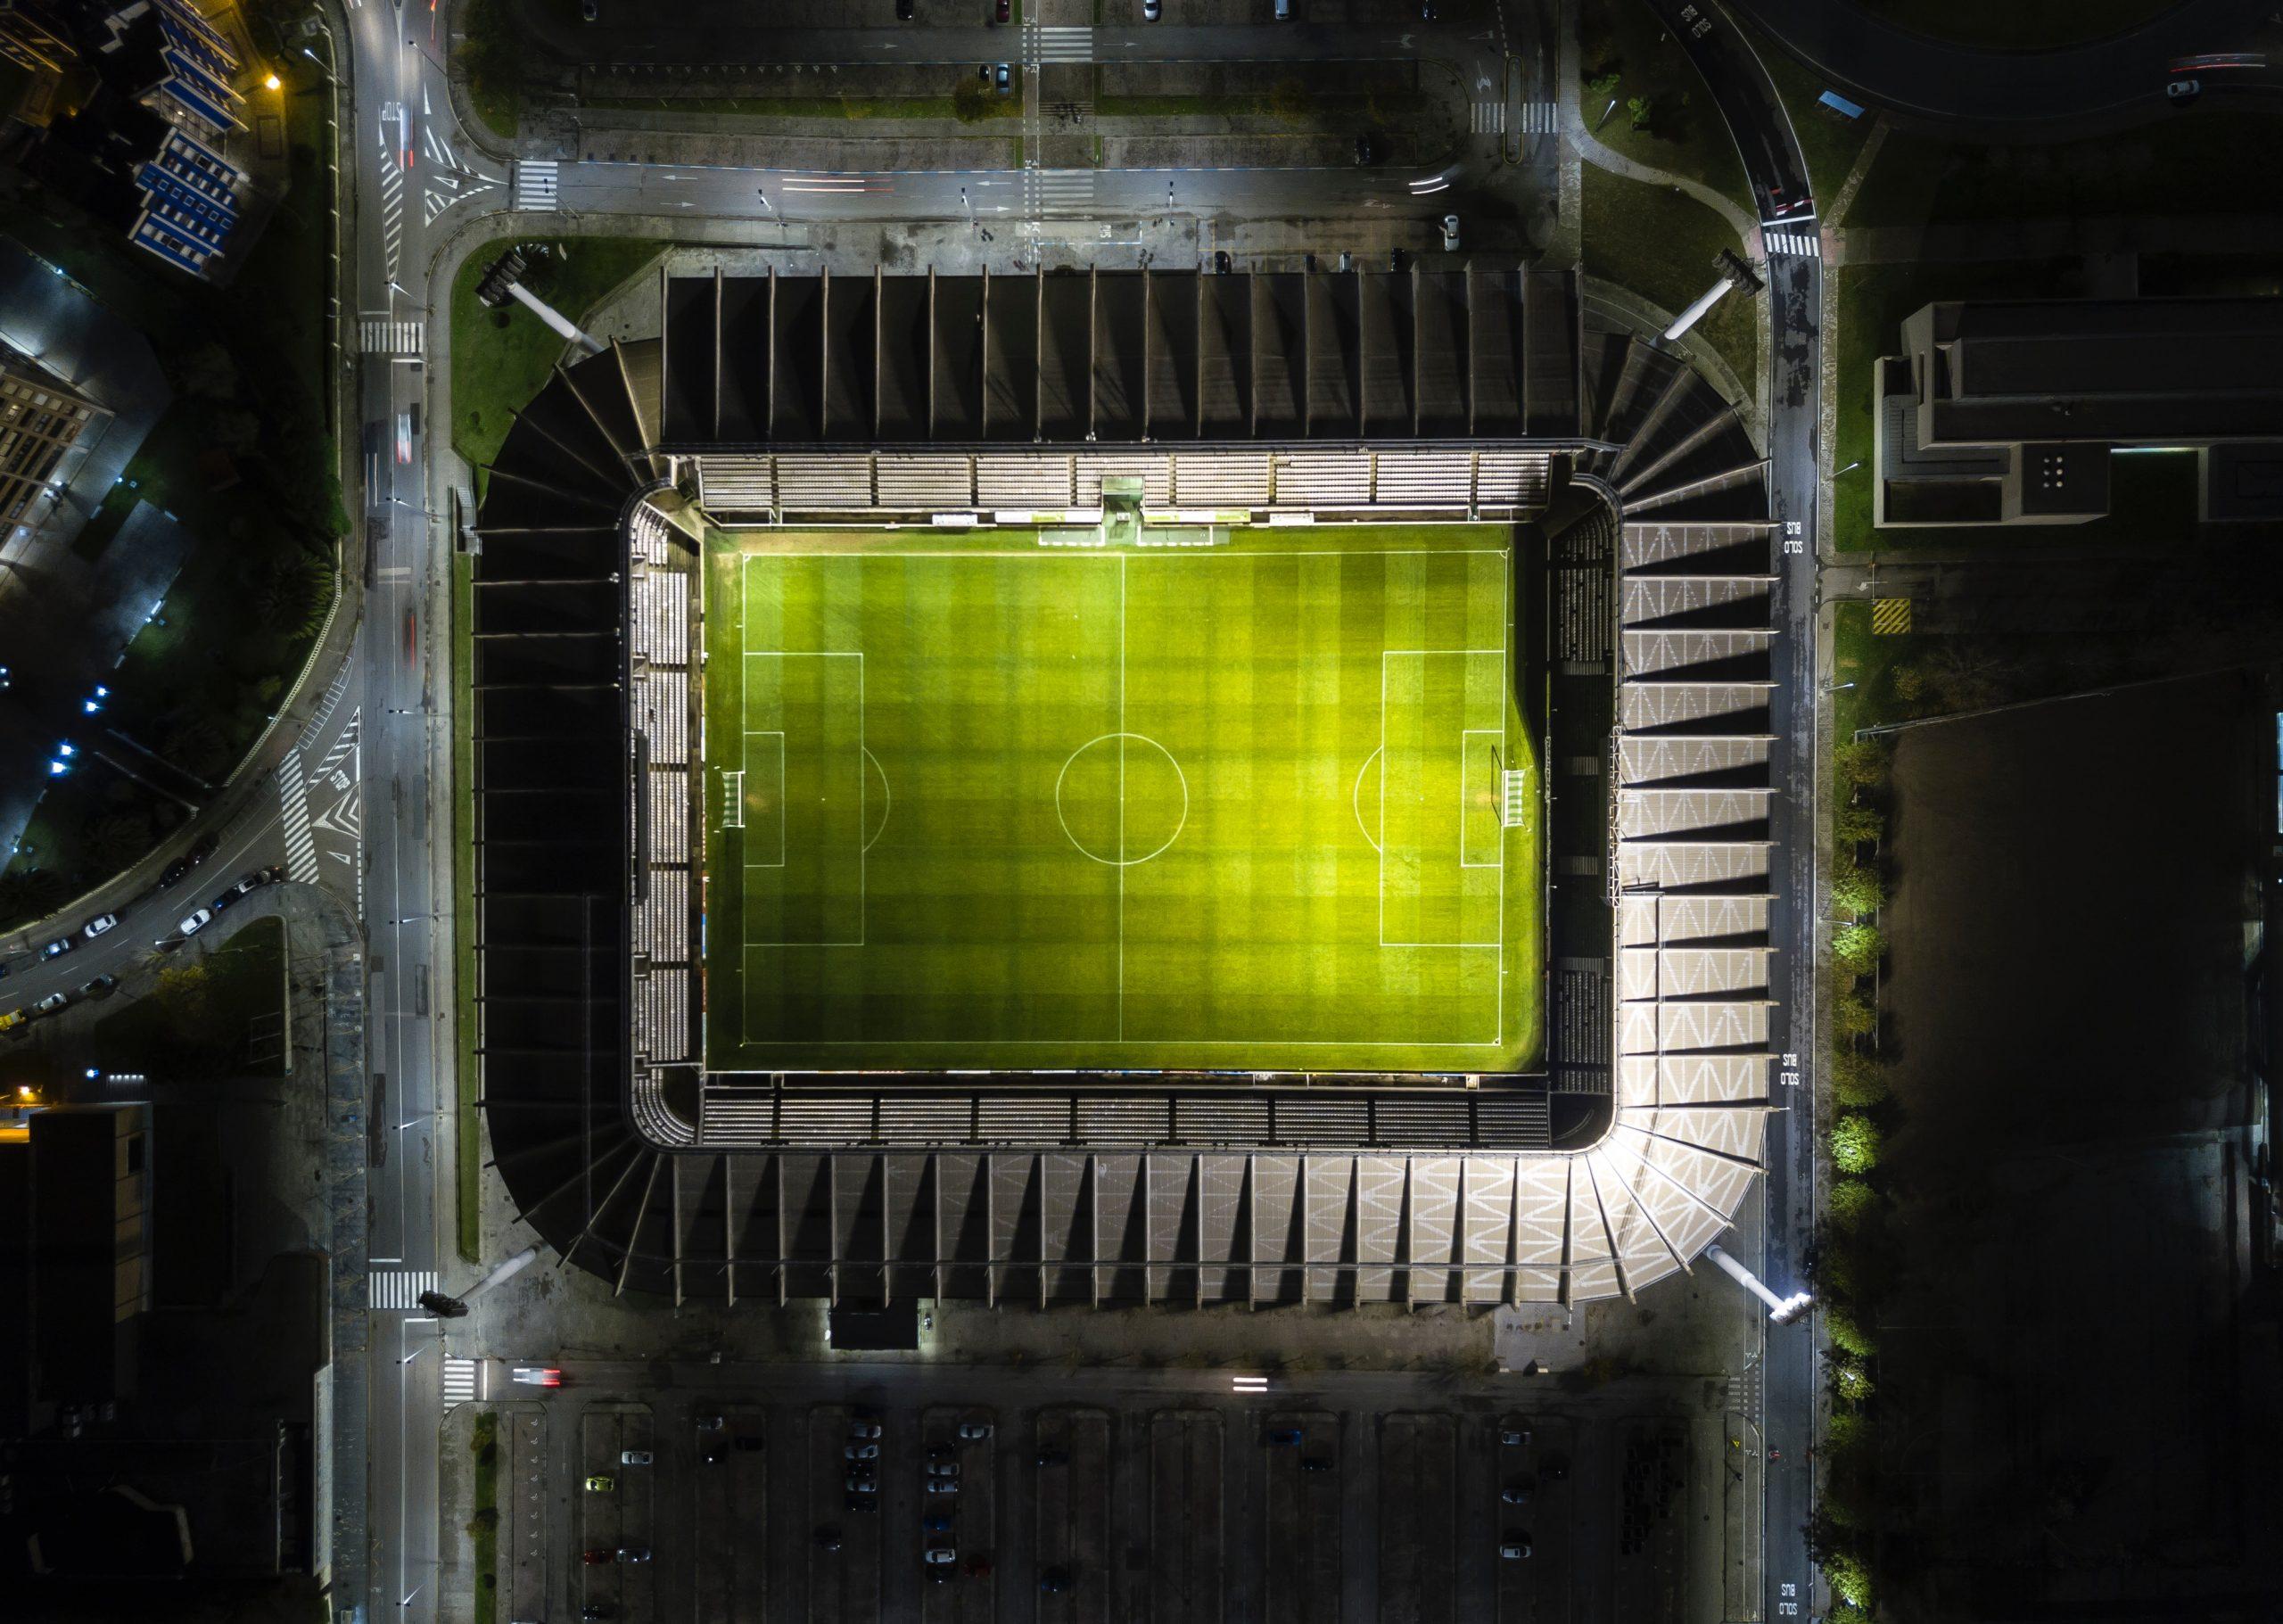 Birds eye view of large football stadium